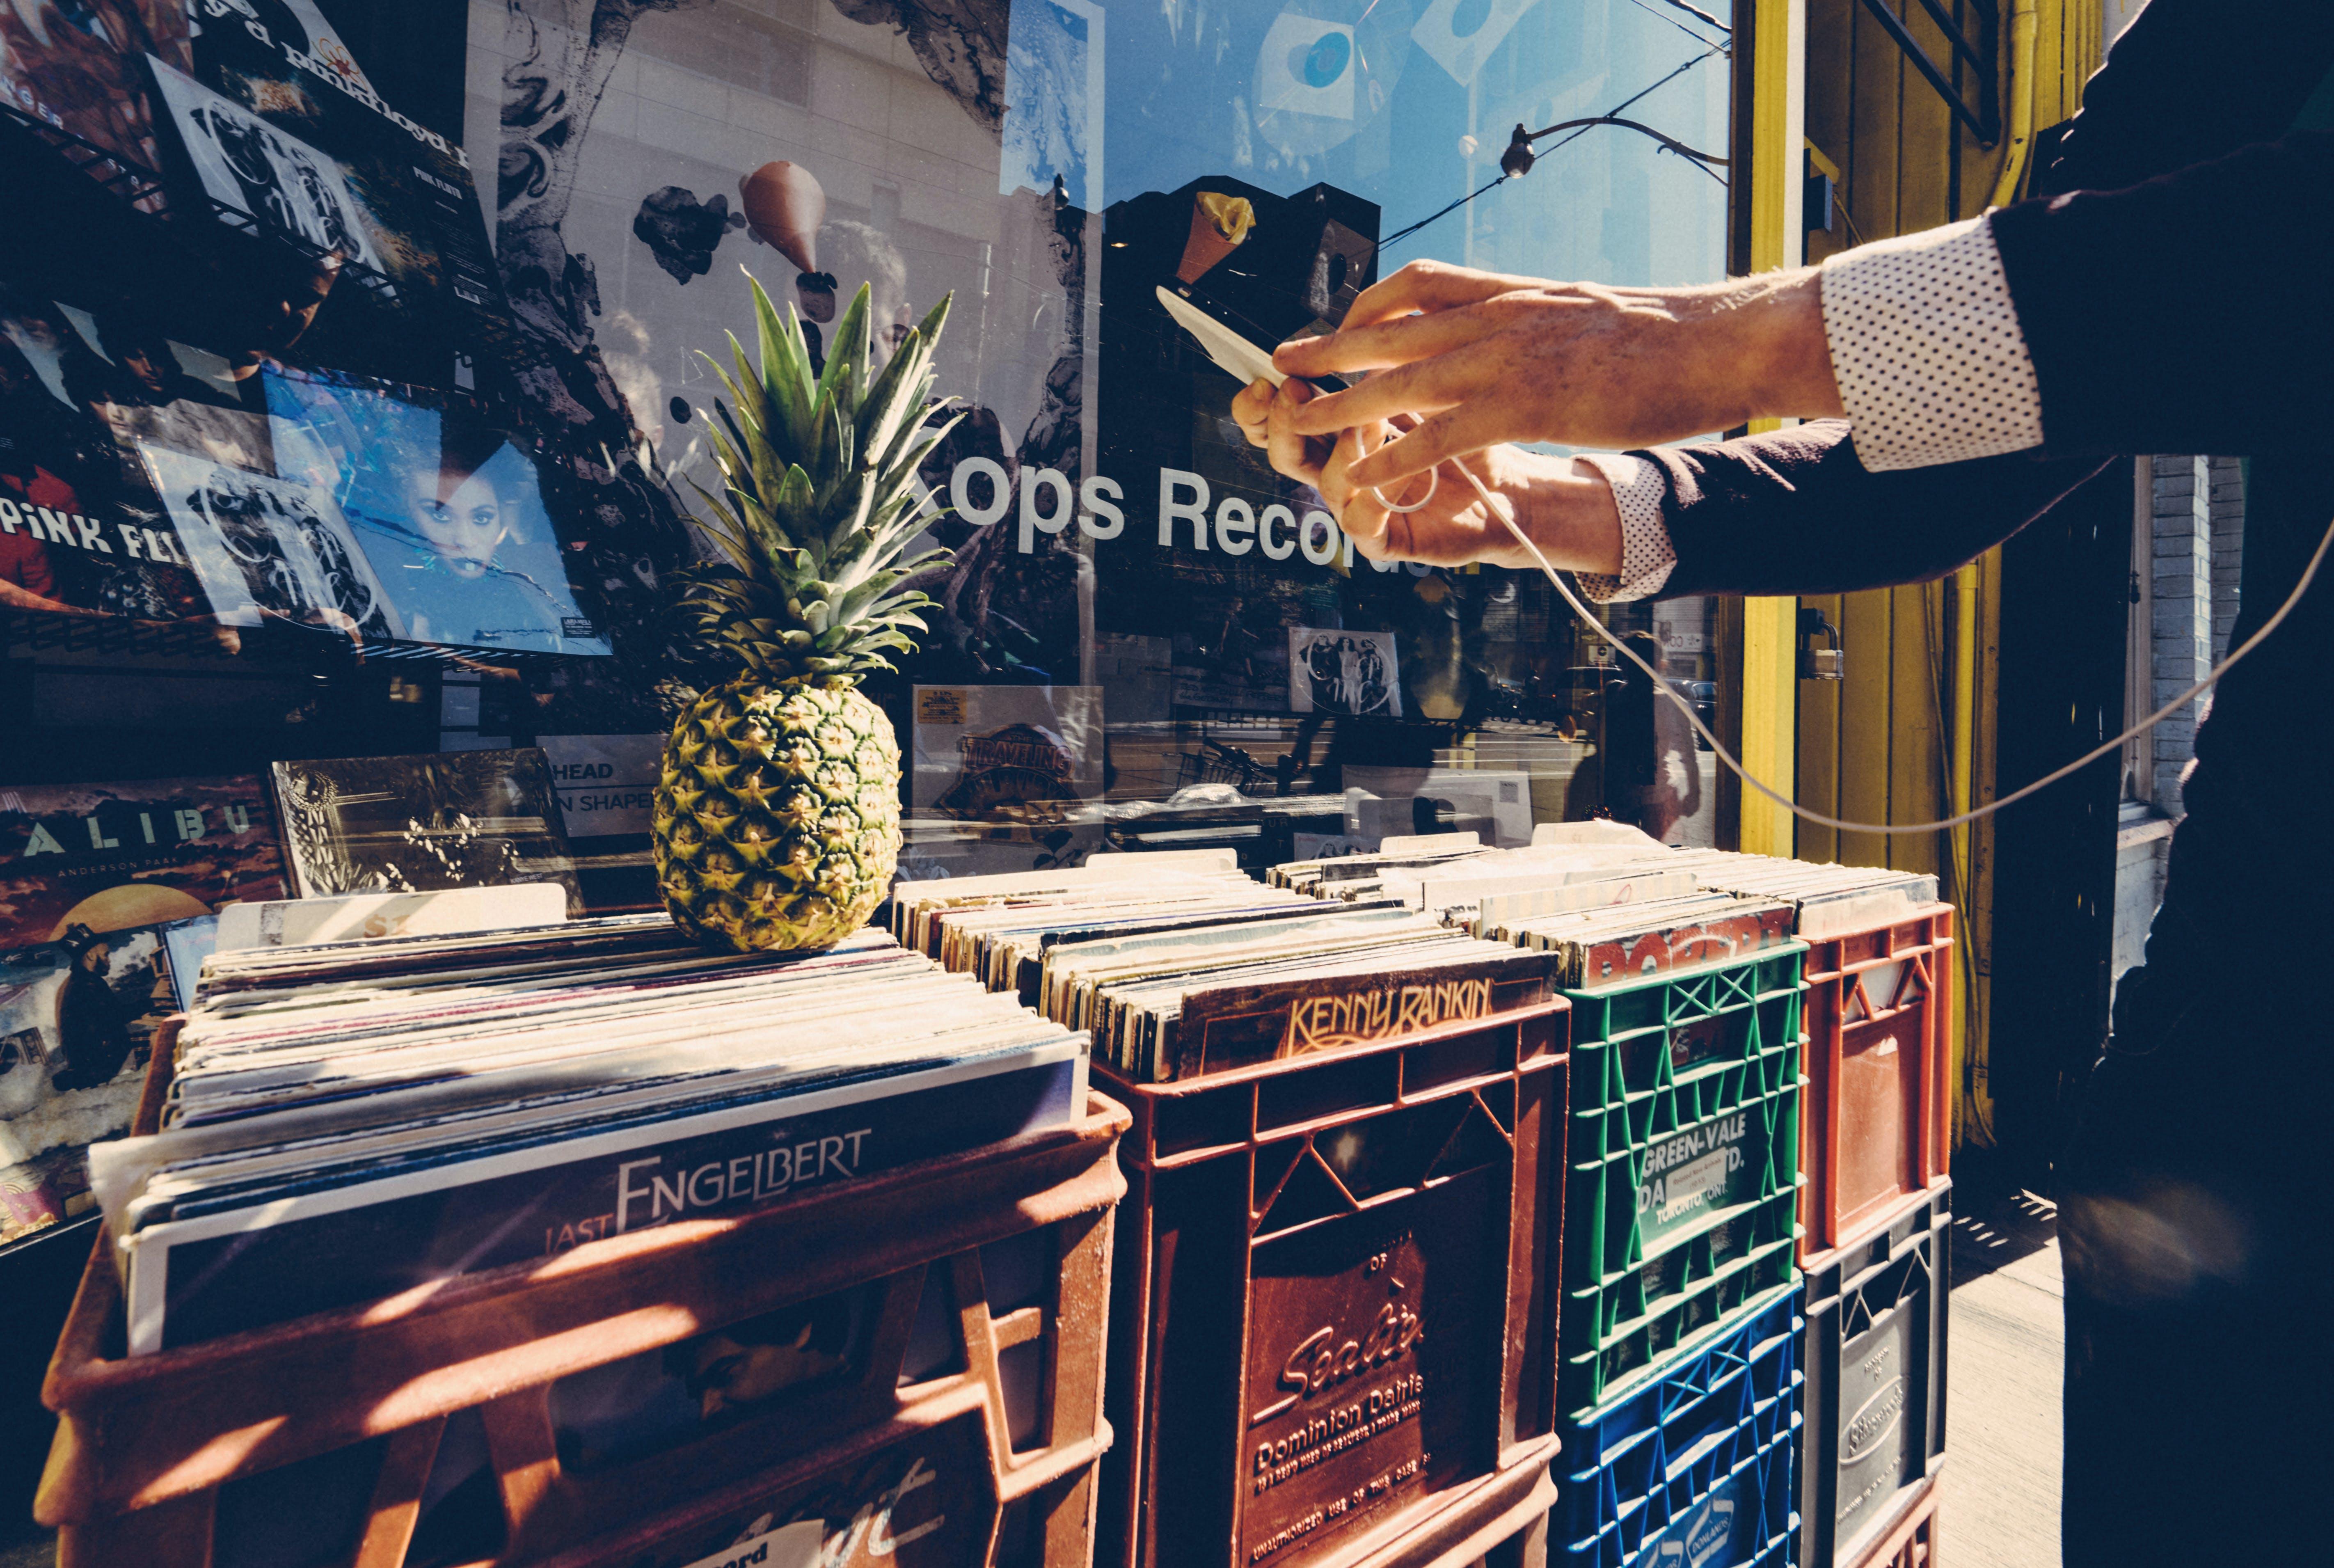 adult, commerce, crate